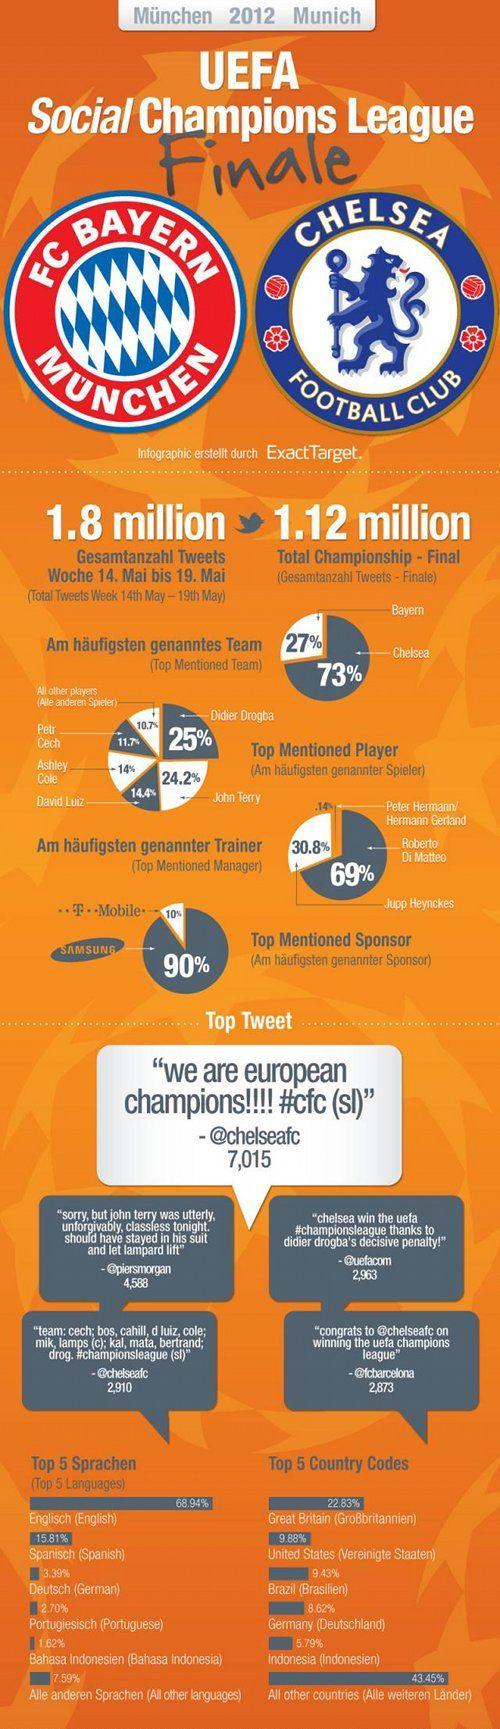 The Champions League social media final: Domination Champions, Infographic Socialmedia, Champions League, Social Media, Bayern Munich, Twitter Infographic, Media Infographic, League Finals, Chelsea Domination